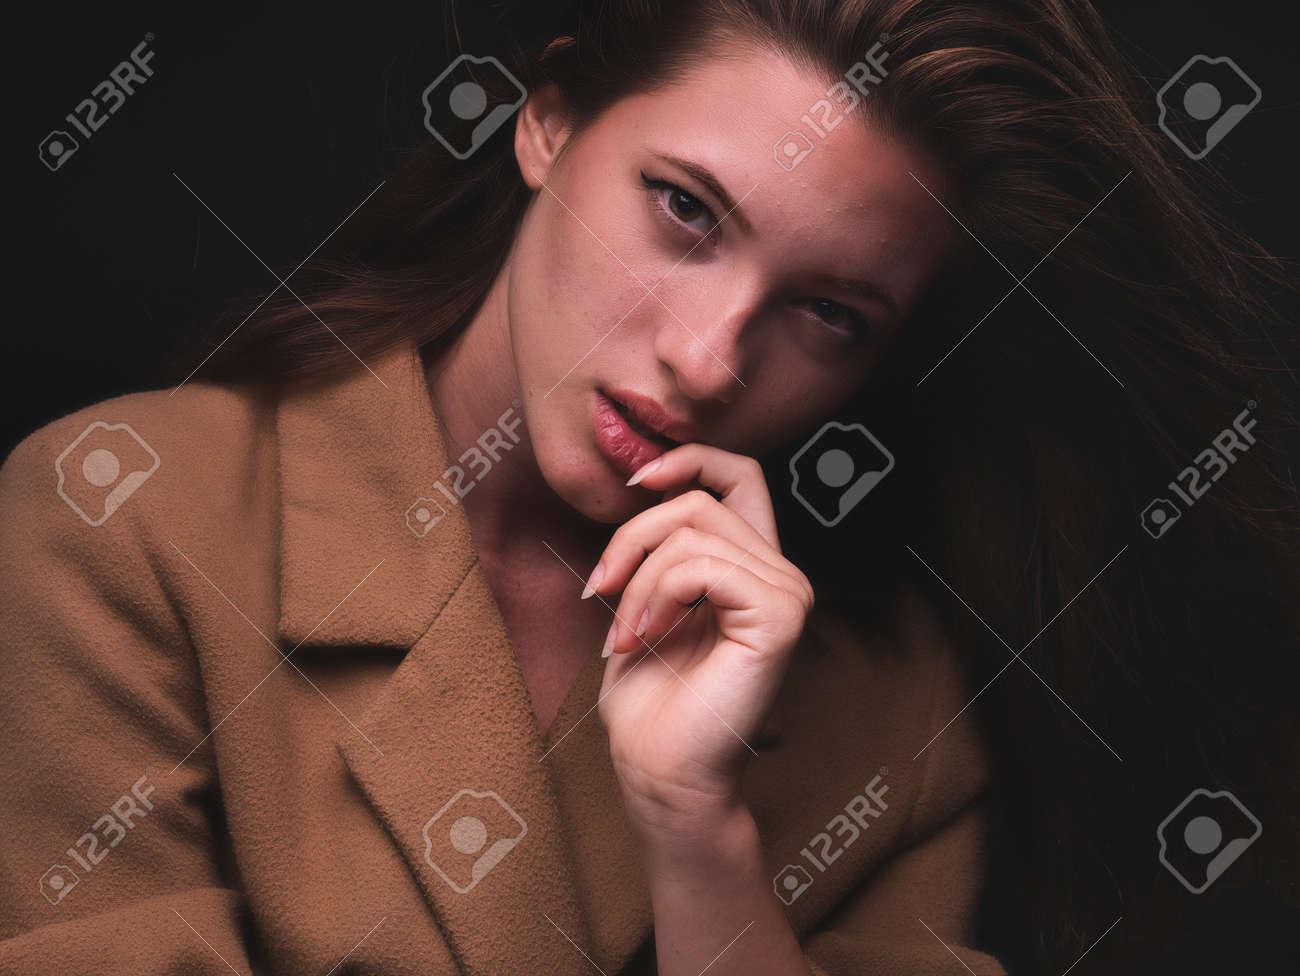 high key. Conceptual portrait with plastic sheets. One young woman strugling with plastic sheets. - 164118910